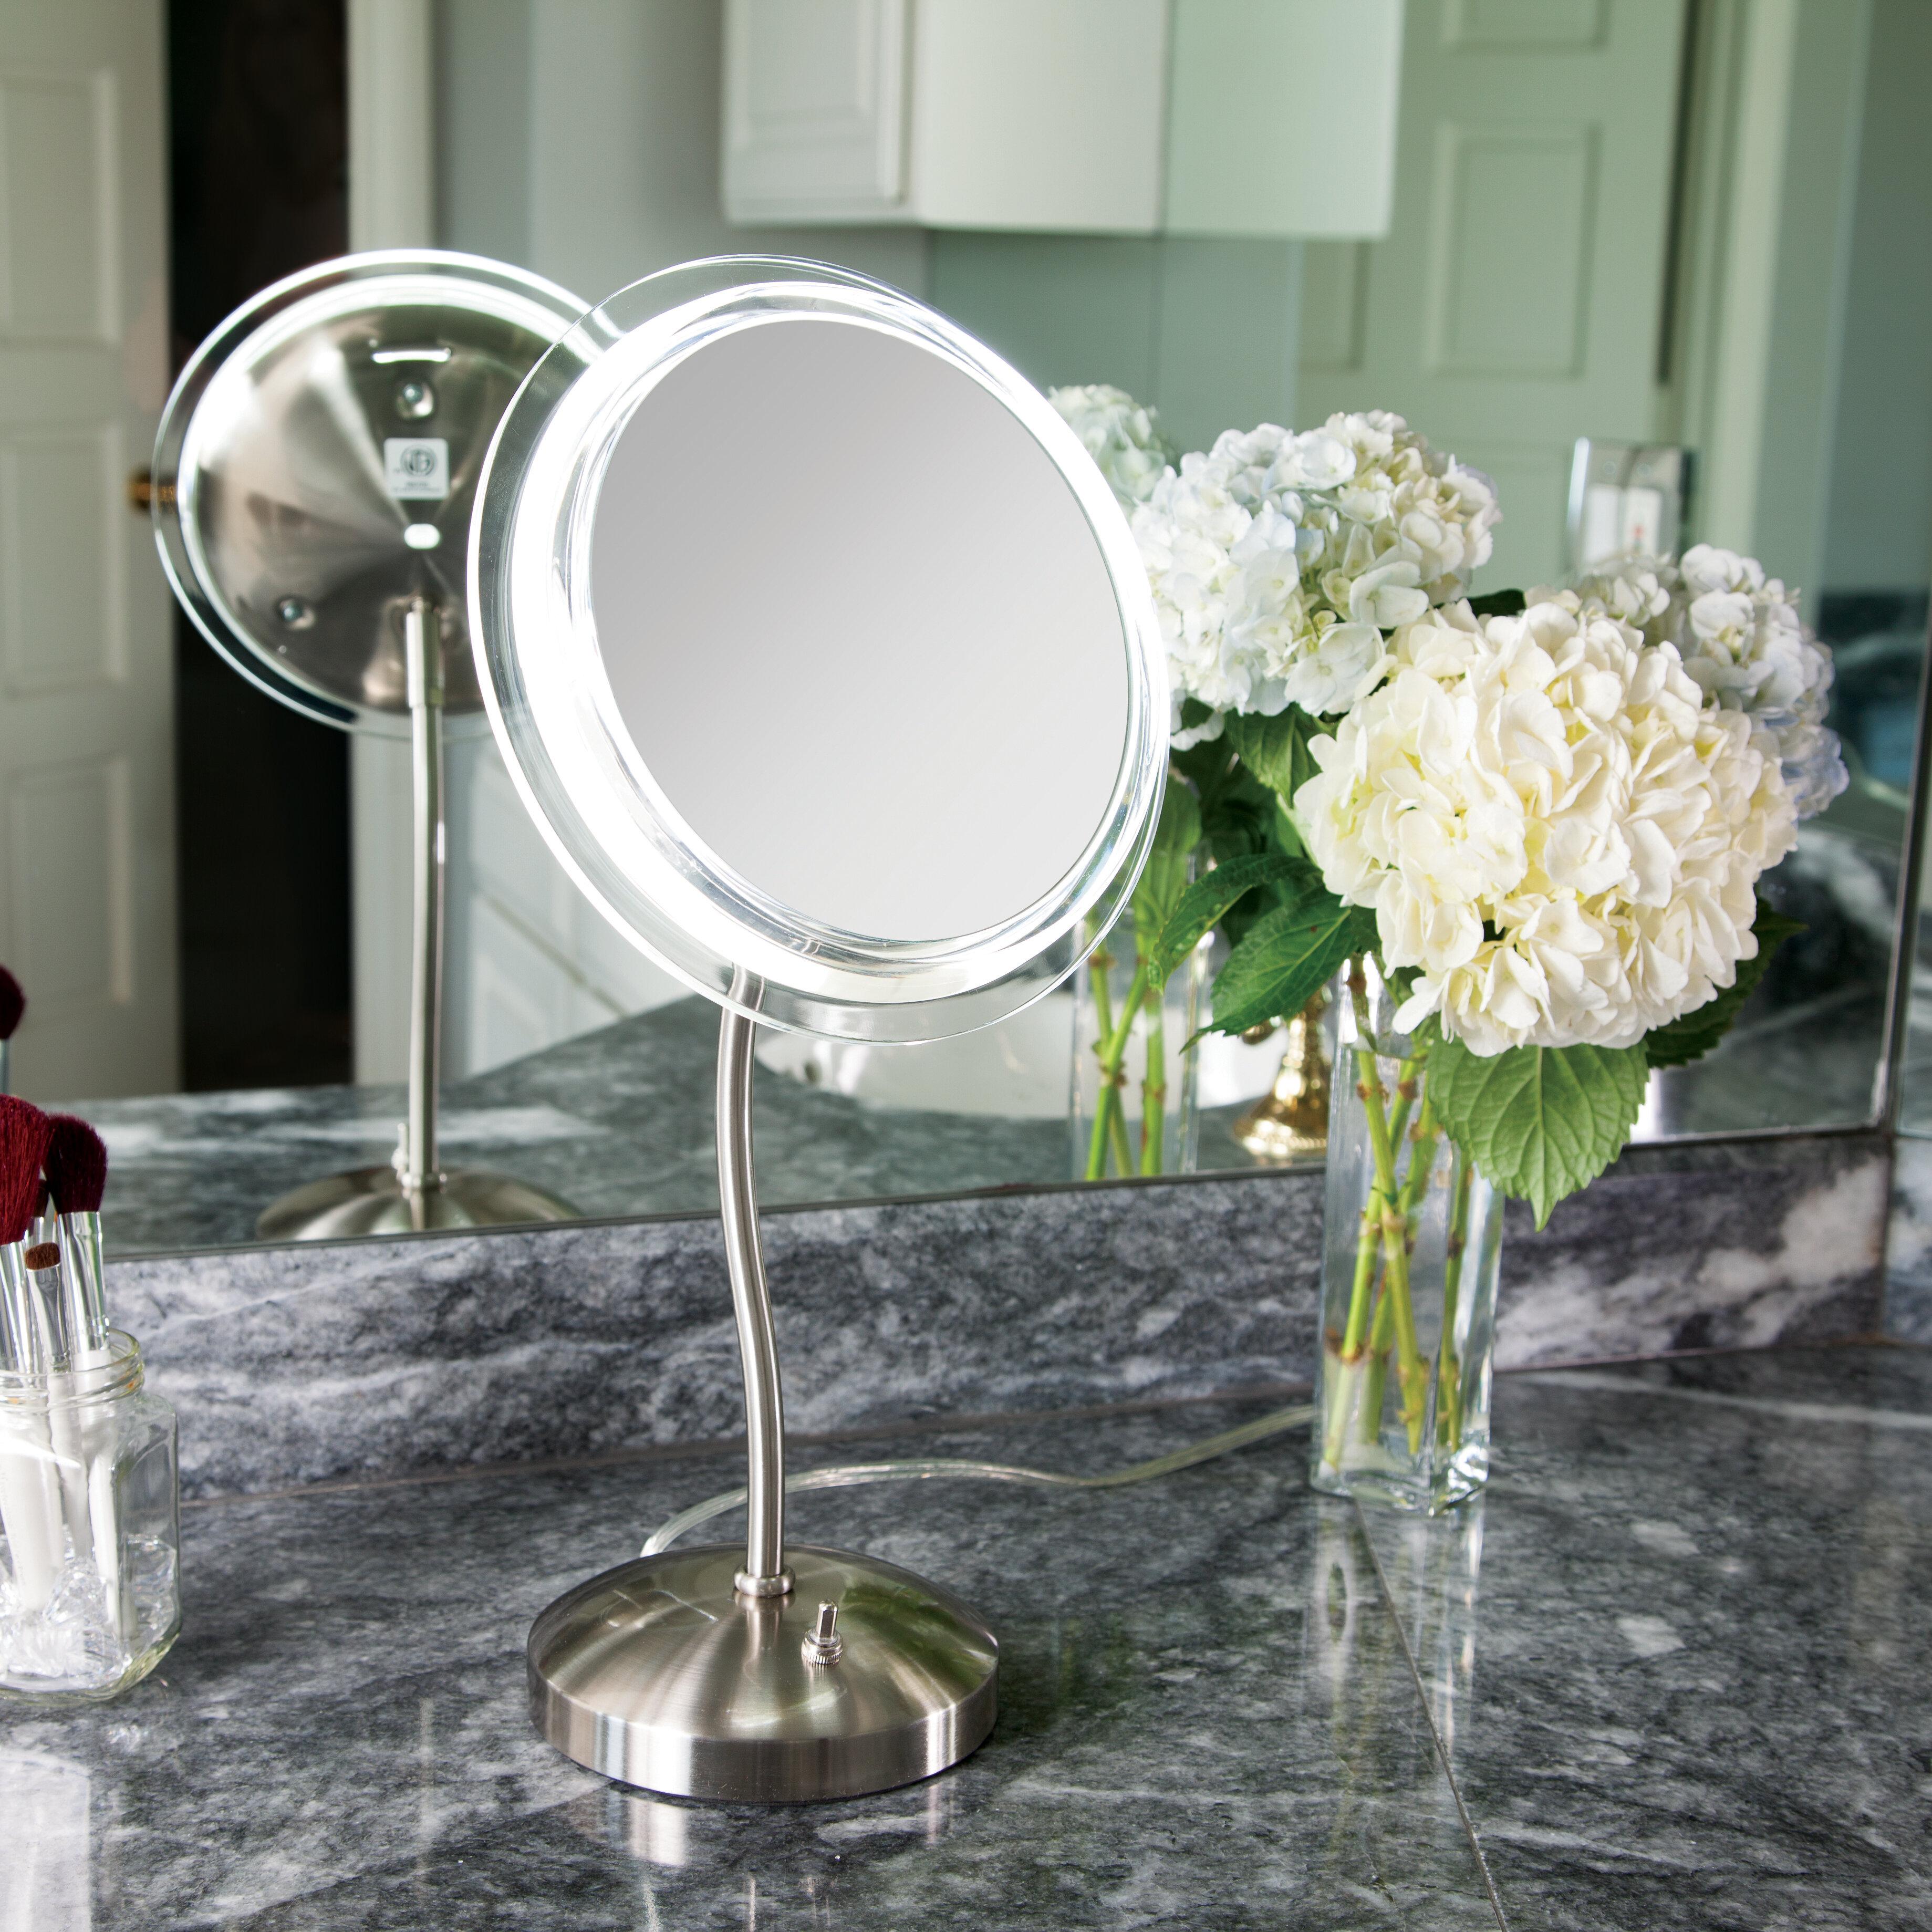 Zadro Makeup Mirror With Surround Light